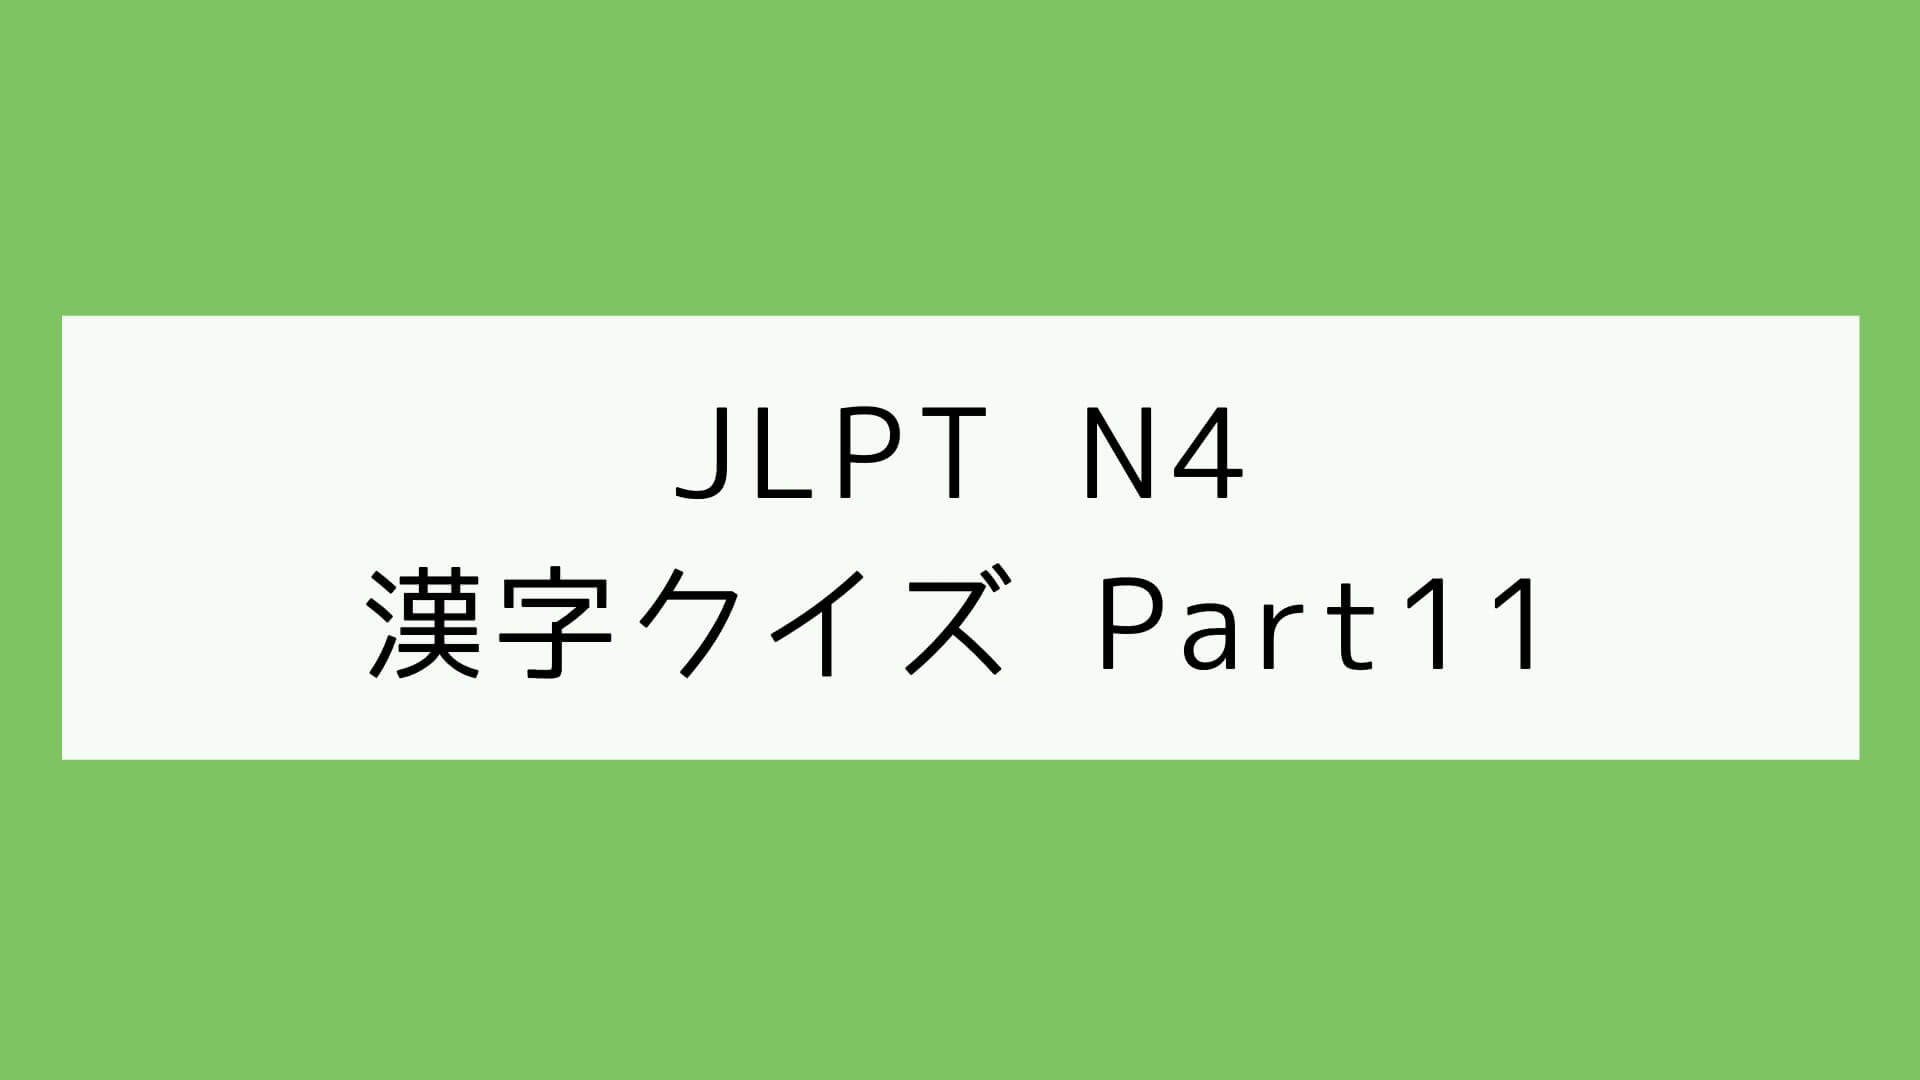 【JLPT N4】漢字クイズ Part11